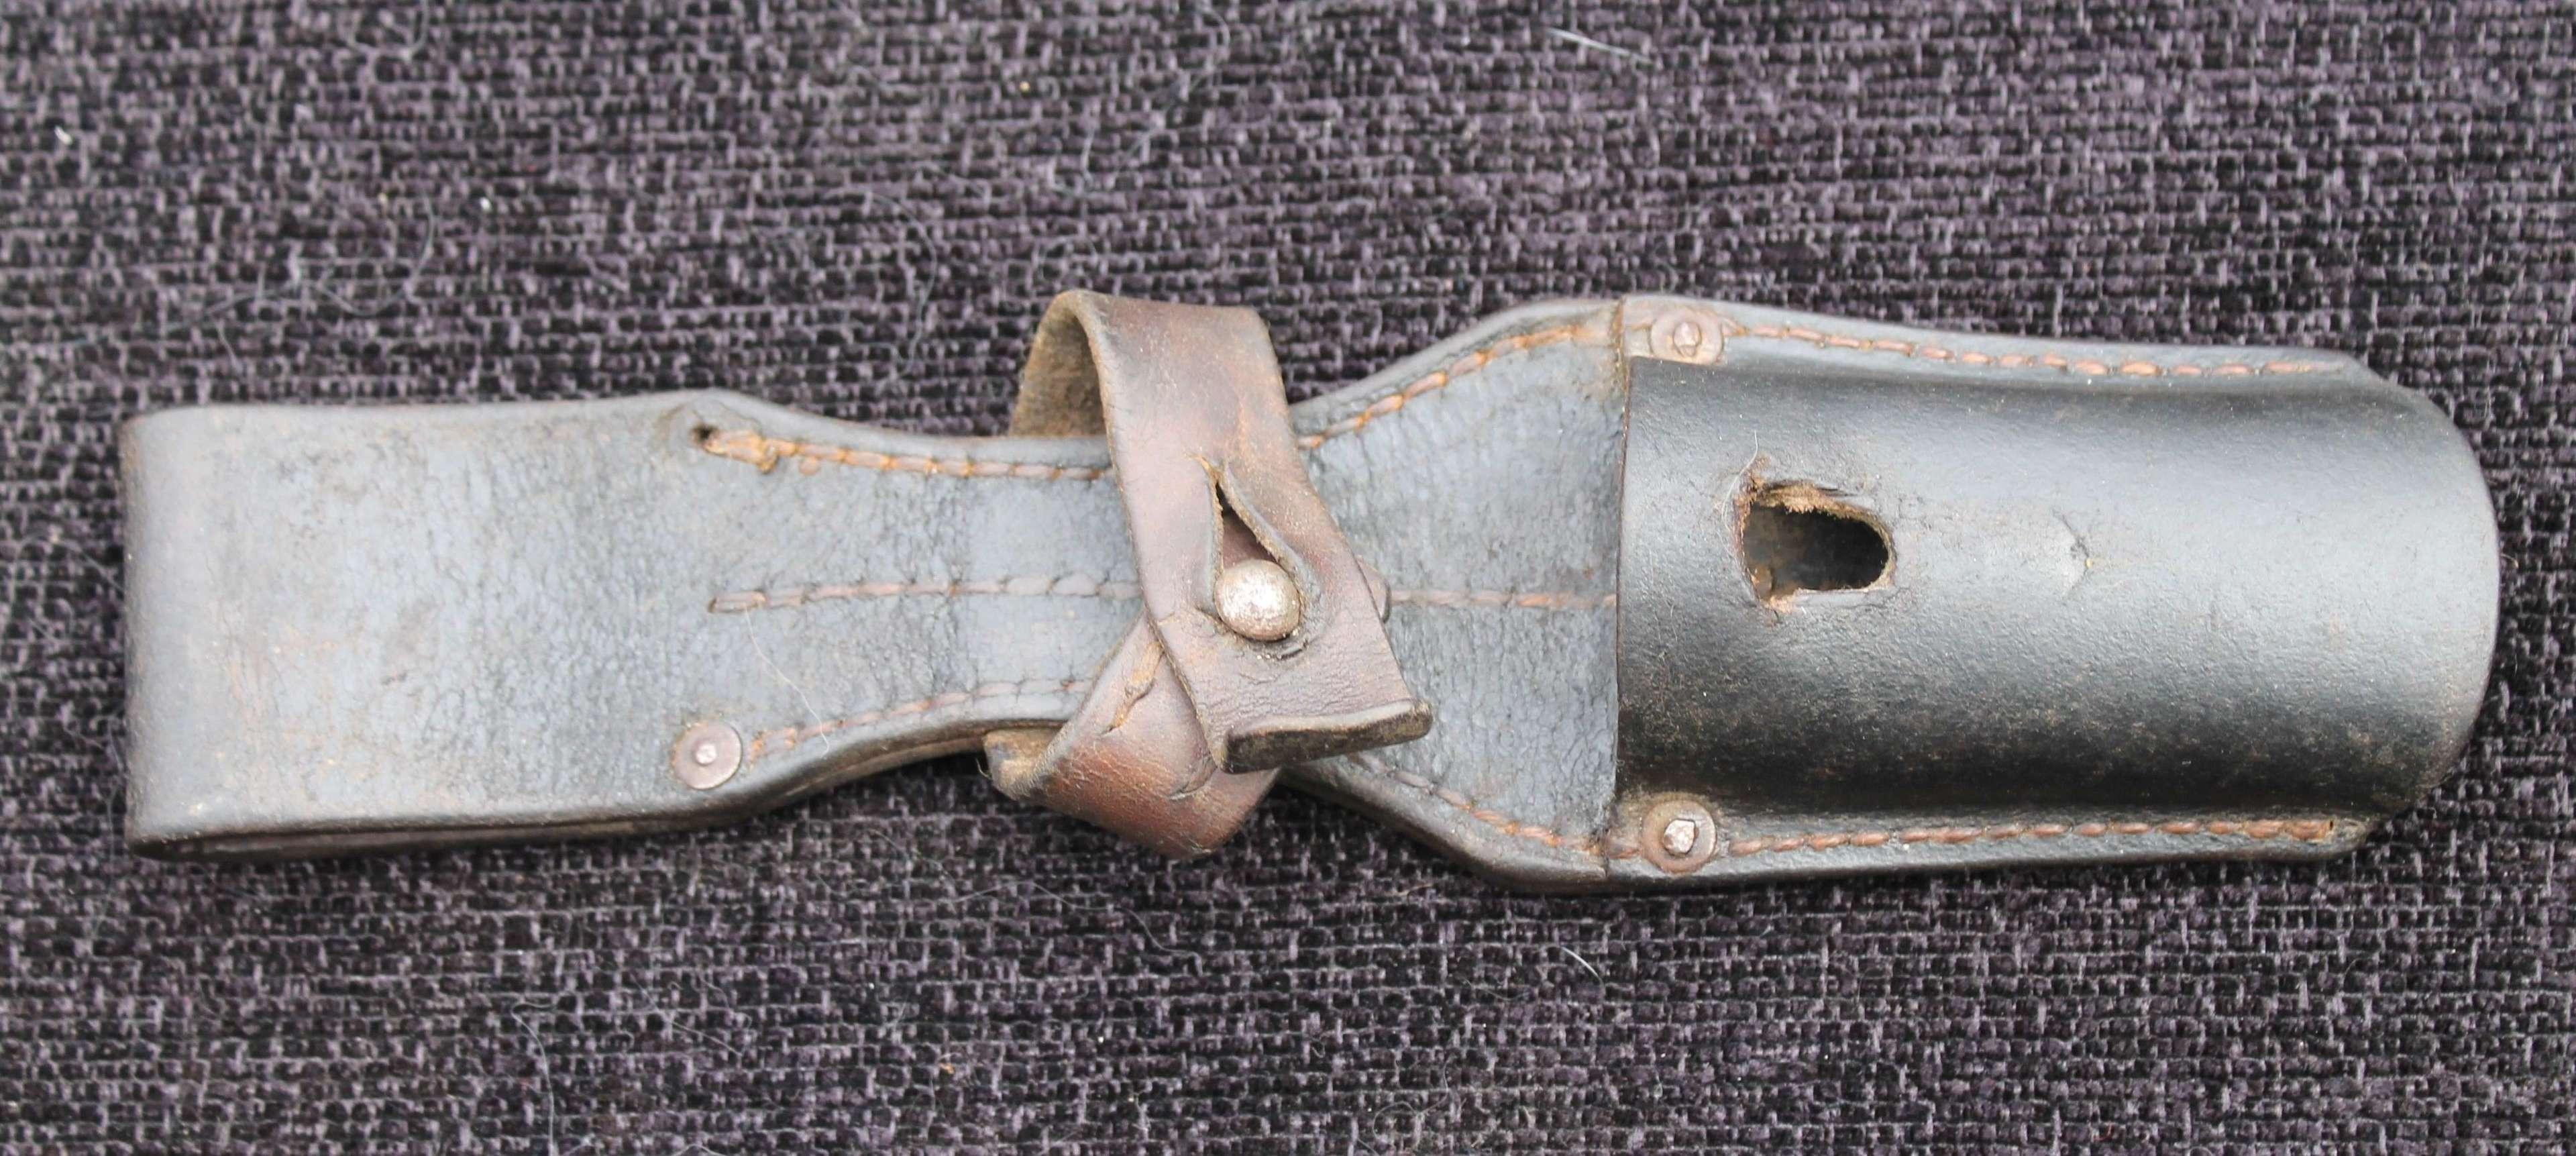 Leather K98 Bayonet Frog (B)